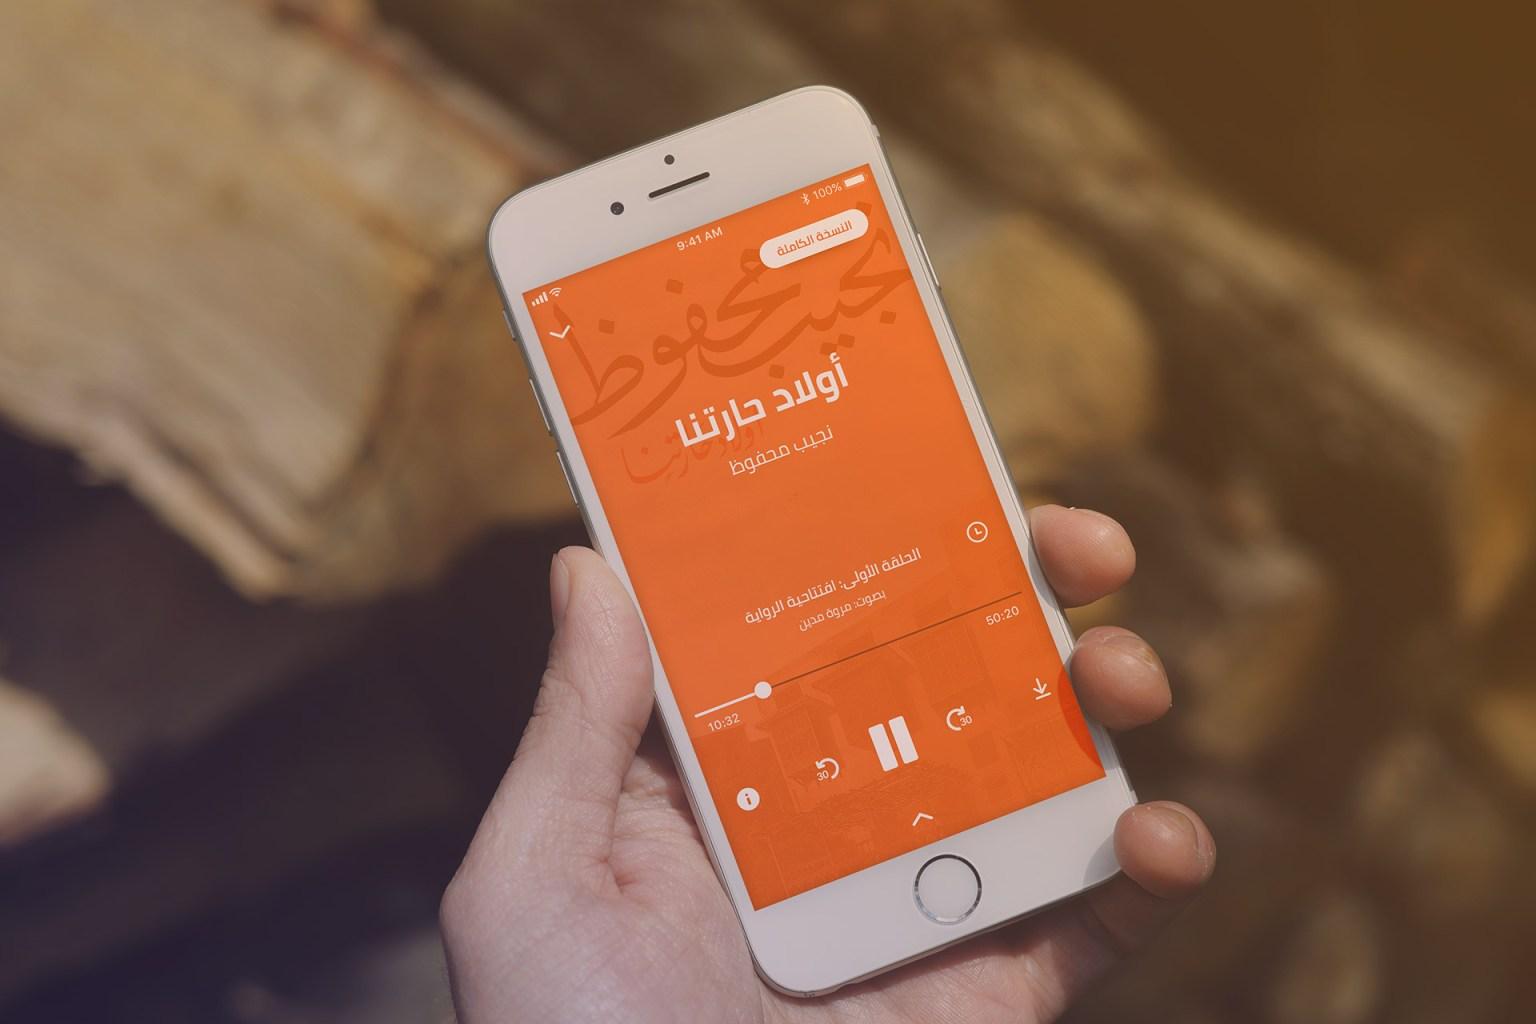 slider1 - أفضل تطبيقات القراءة والبودكاست لتنمية ثقافتك ومهاراتك